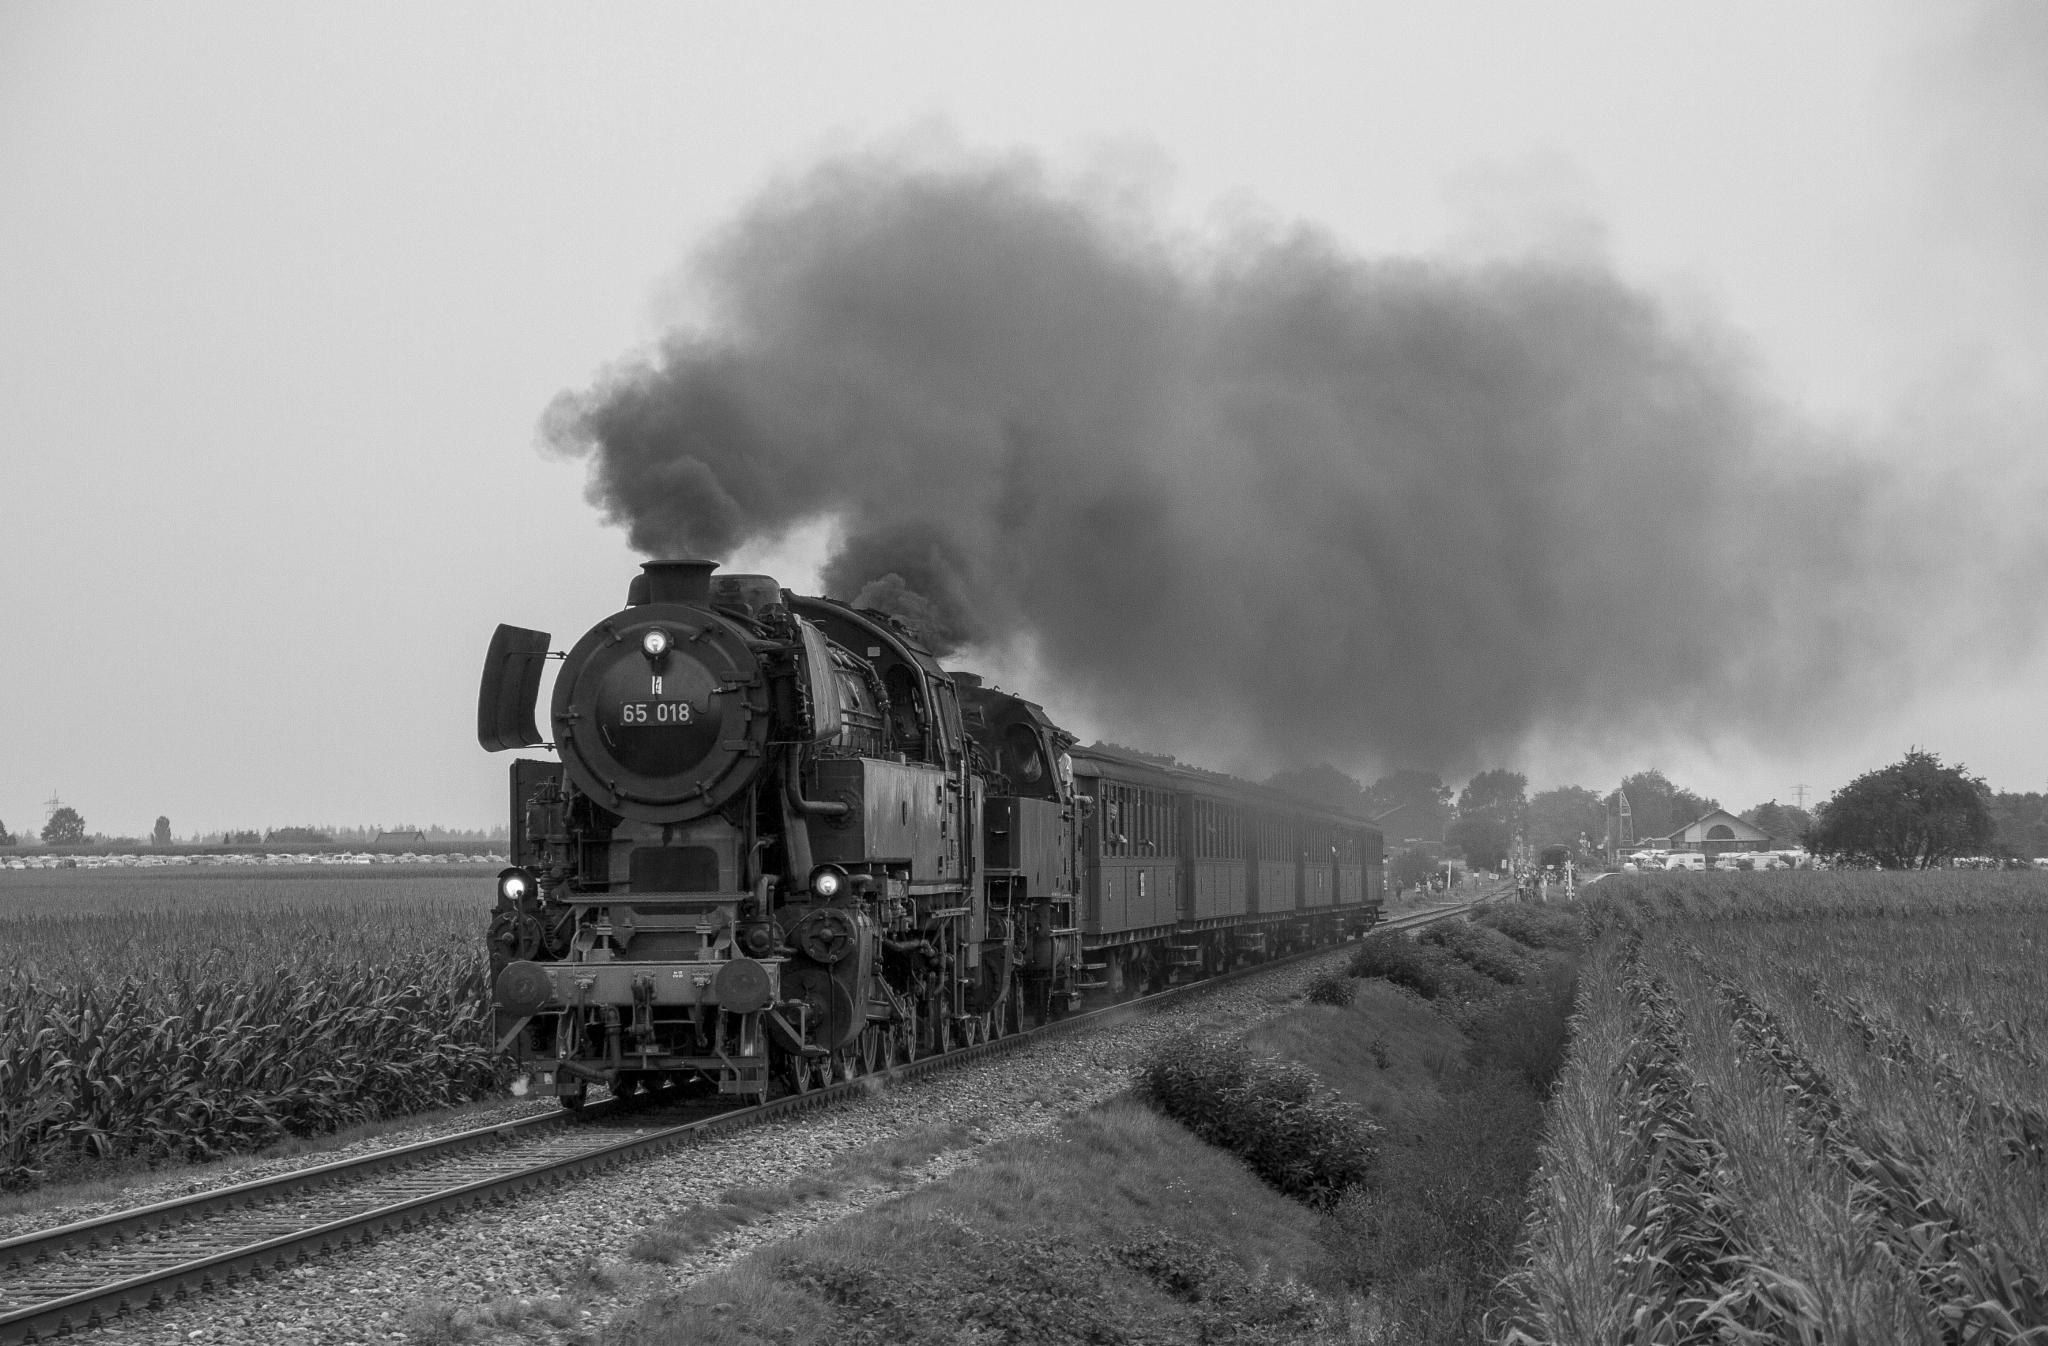 Steamlocomotive BR 65 018 by Rémon Lourier